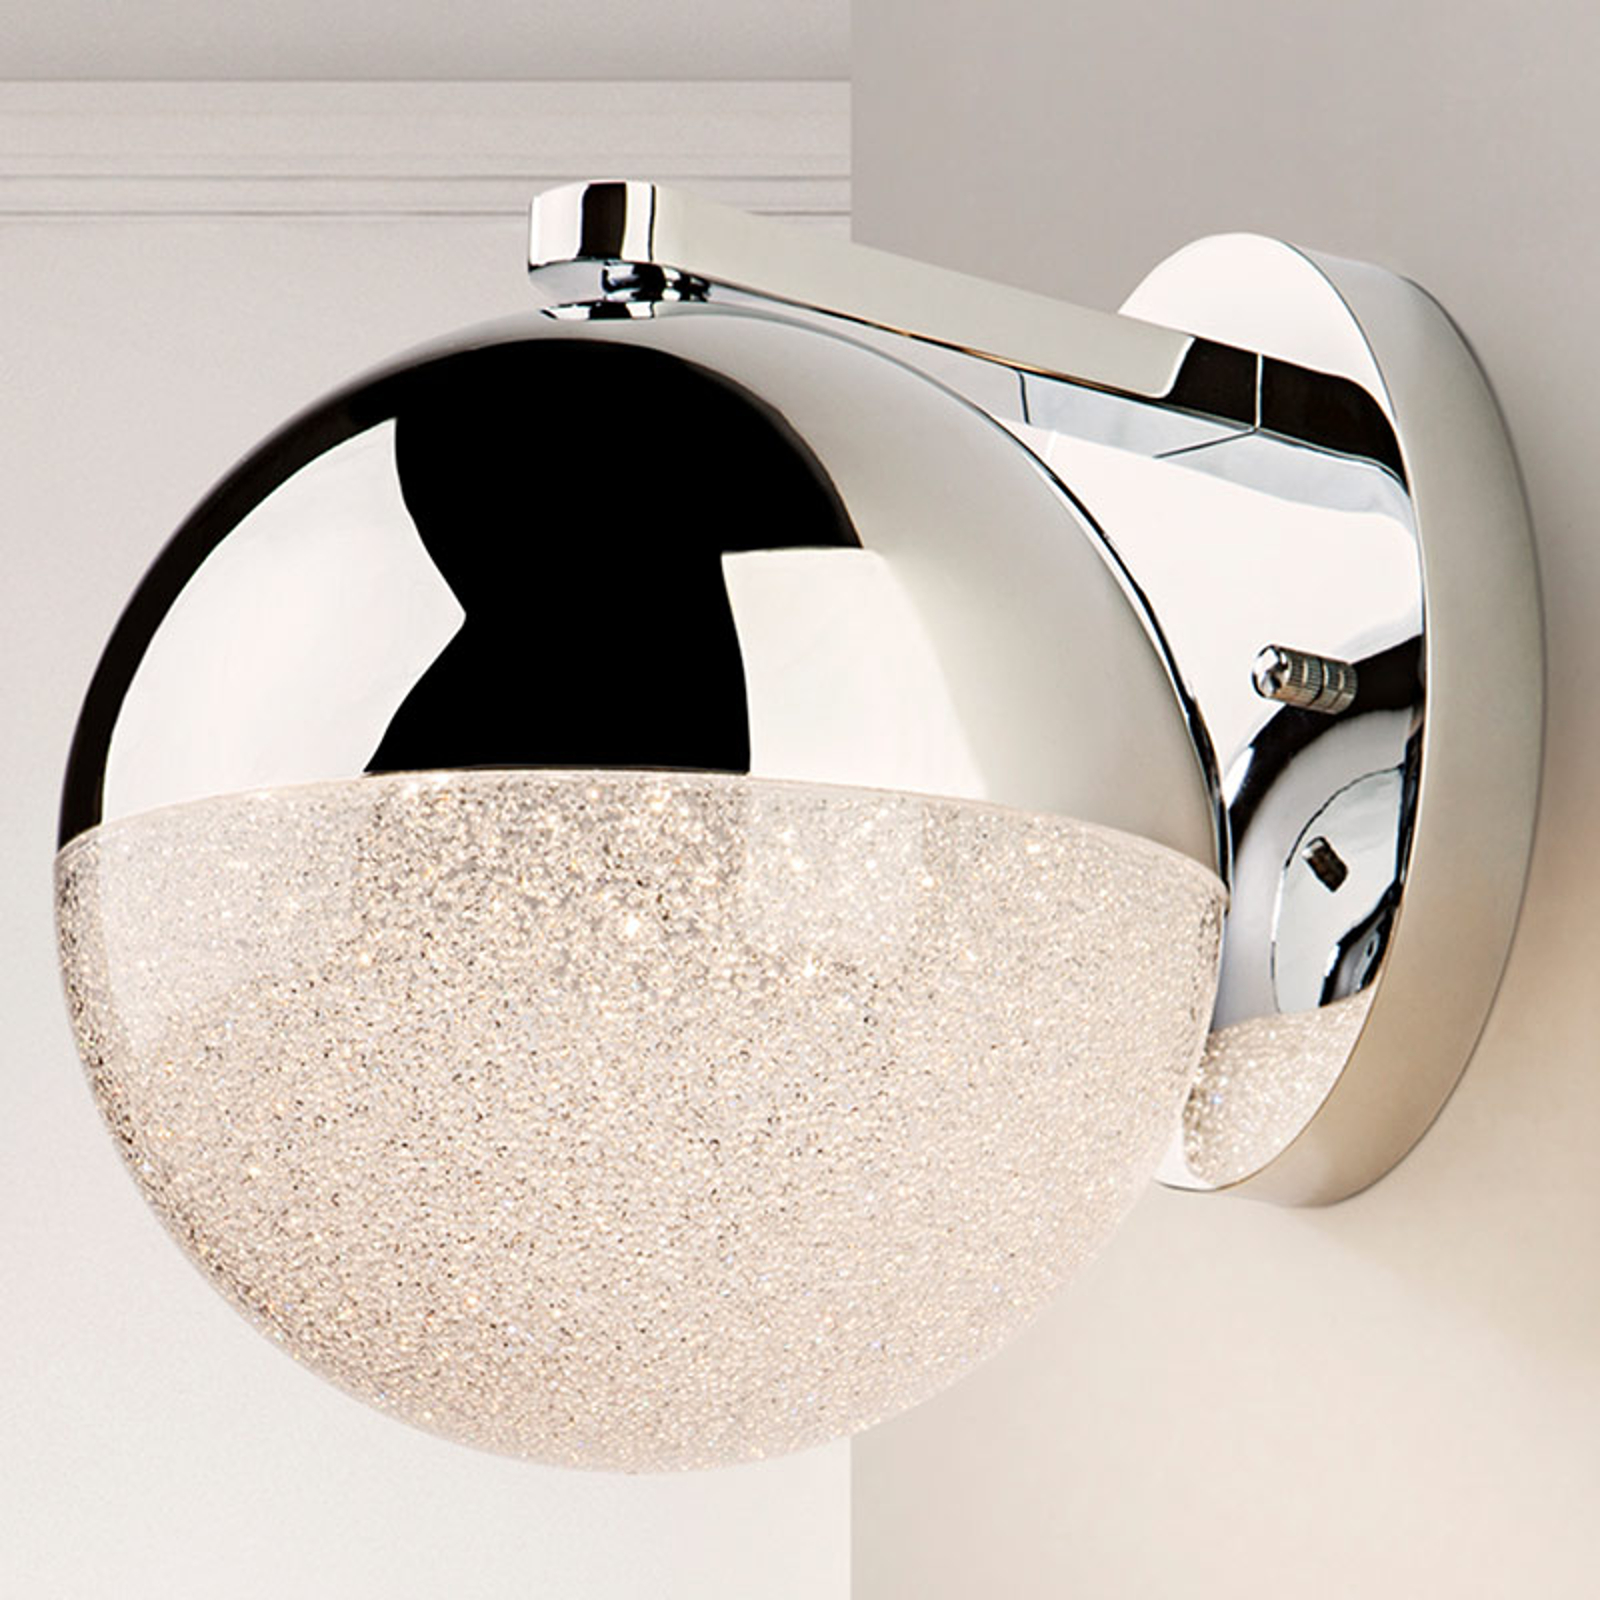 Kinkiet LED Sphere, chrom